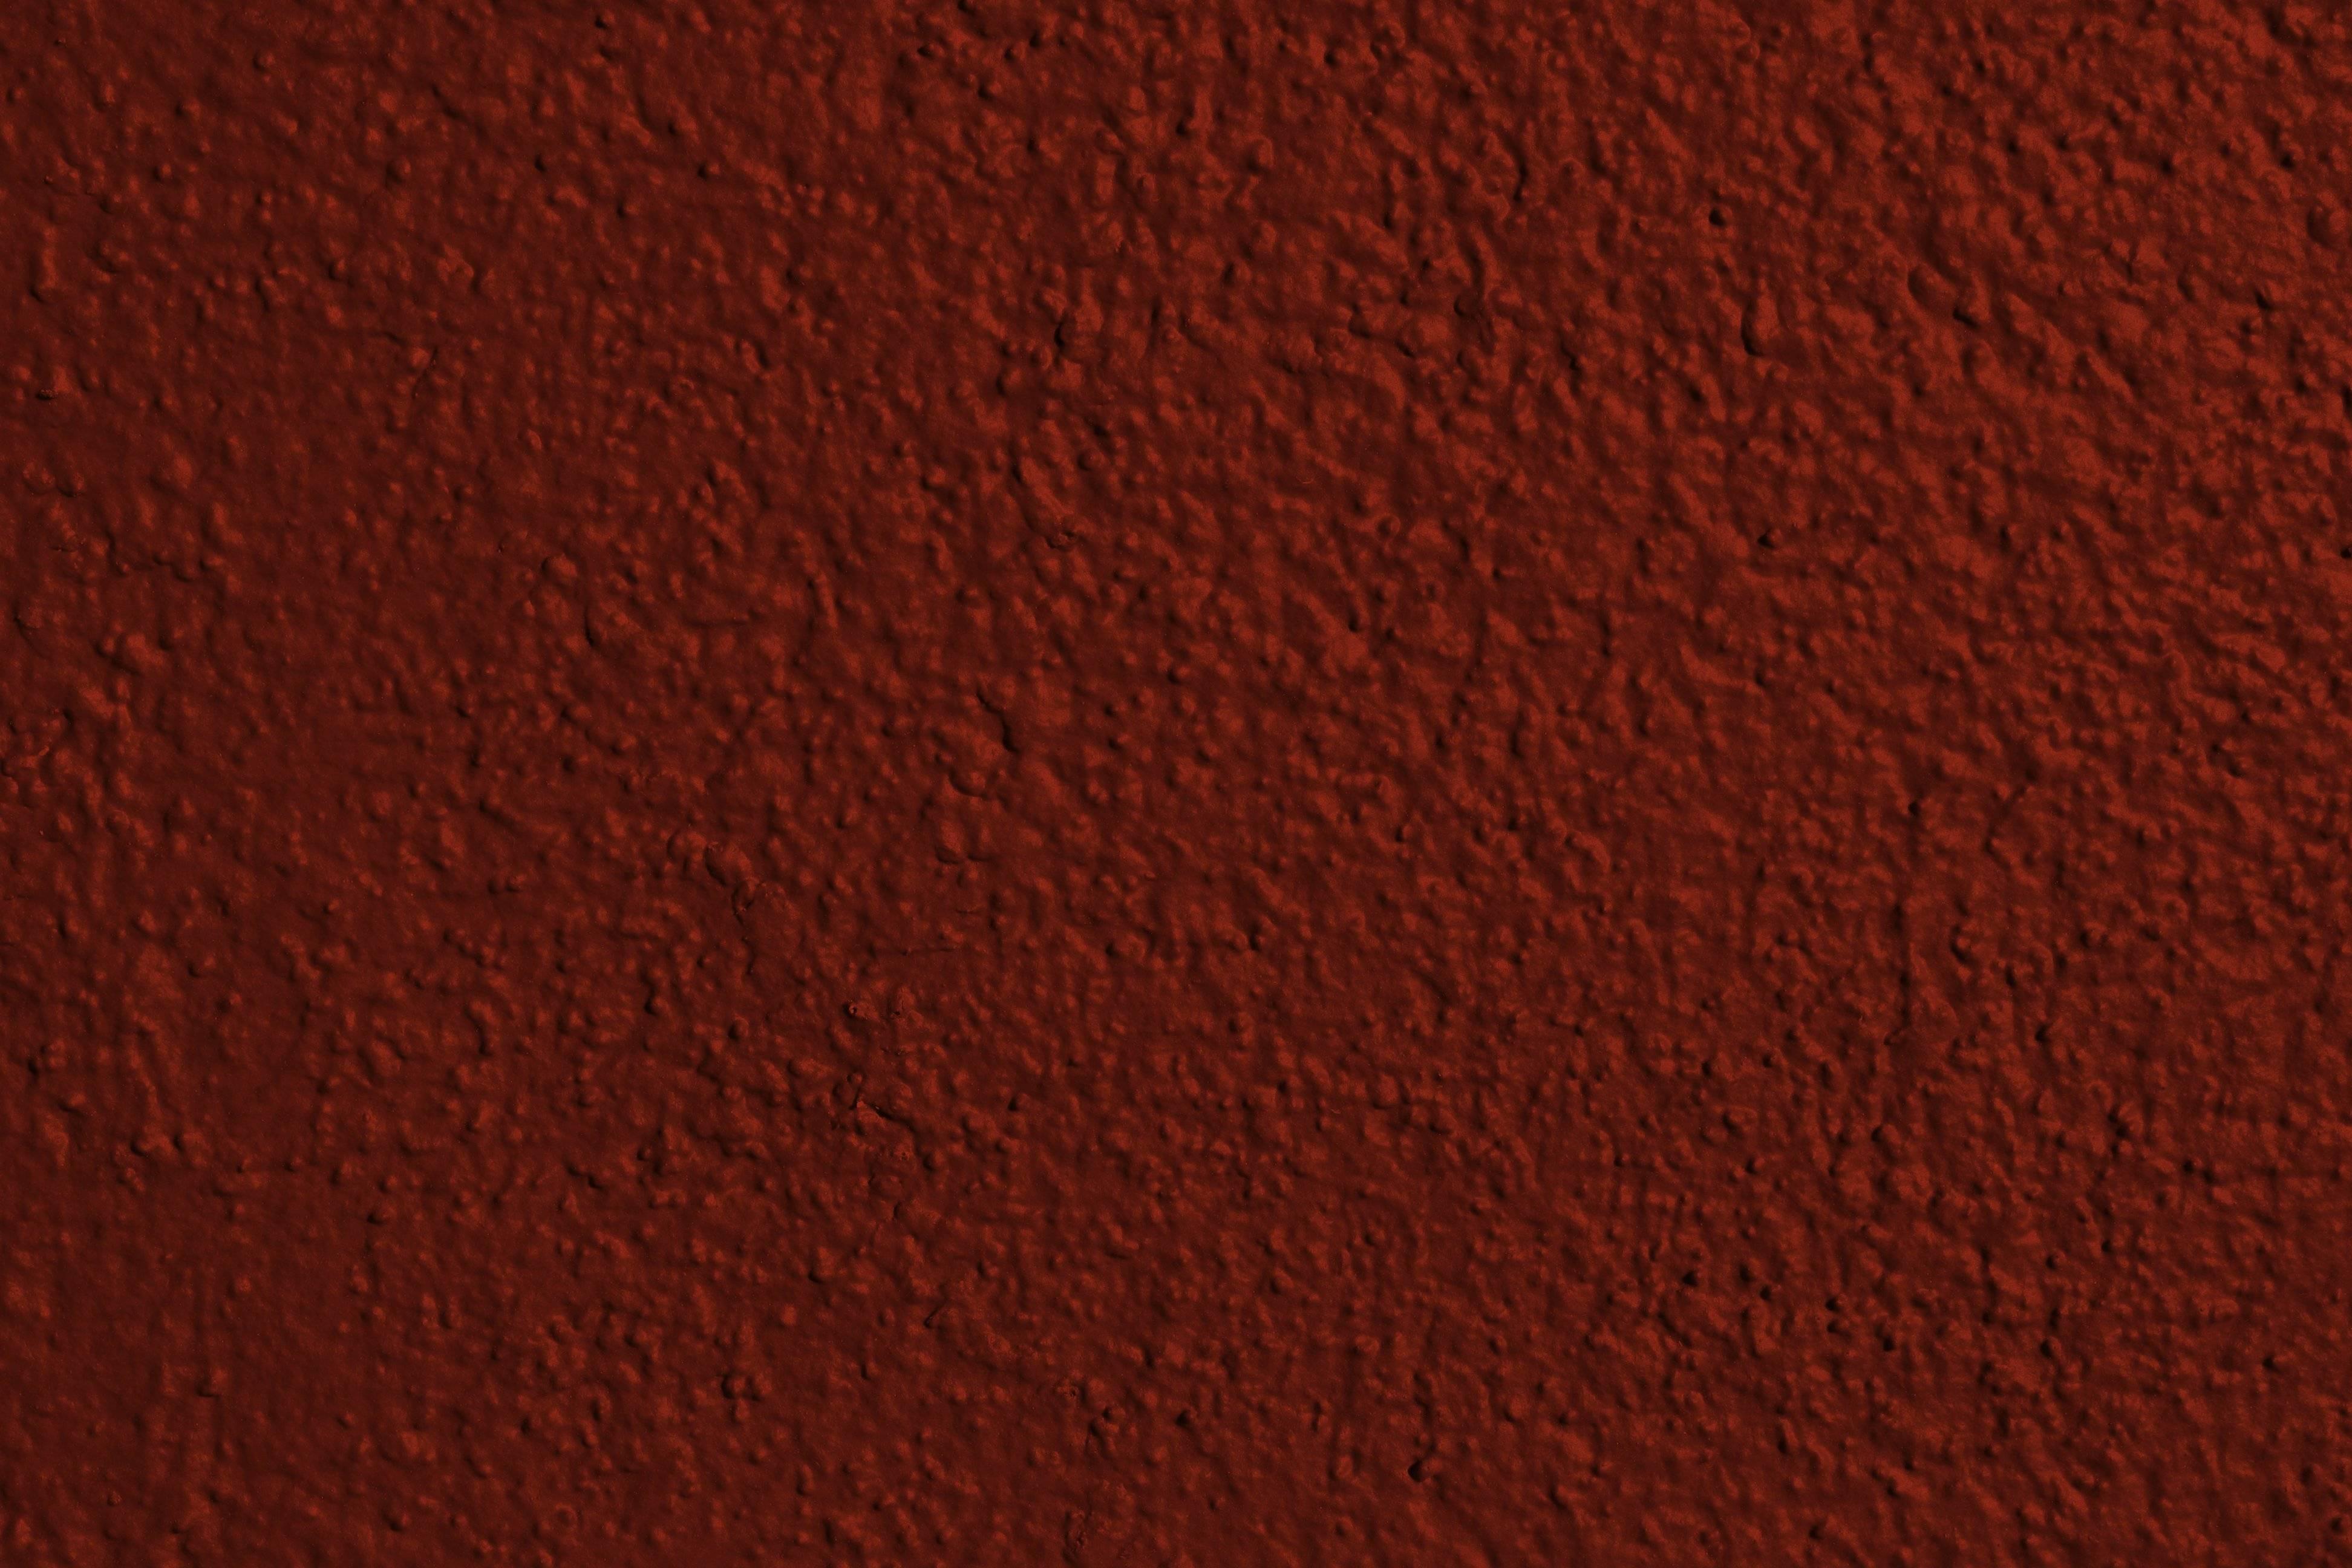 Download Wallpaper Textured Walls 3888x2592 Dark Brick Red Colored